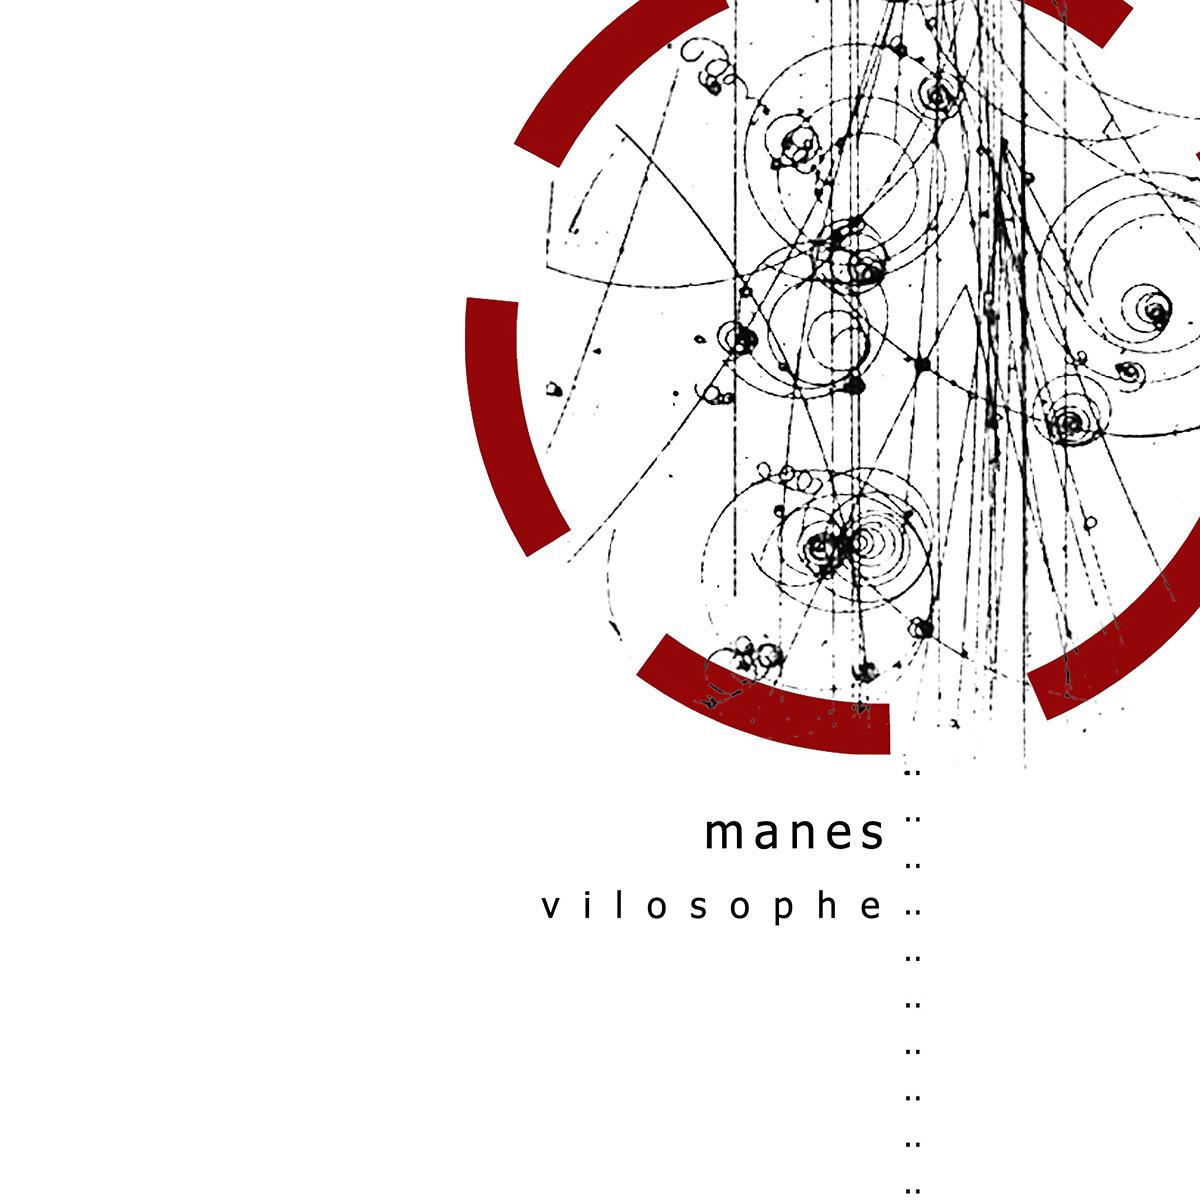 Manes - Vilosophe (album cover)